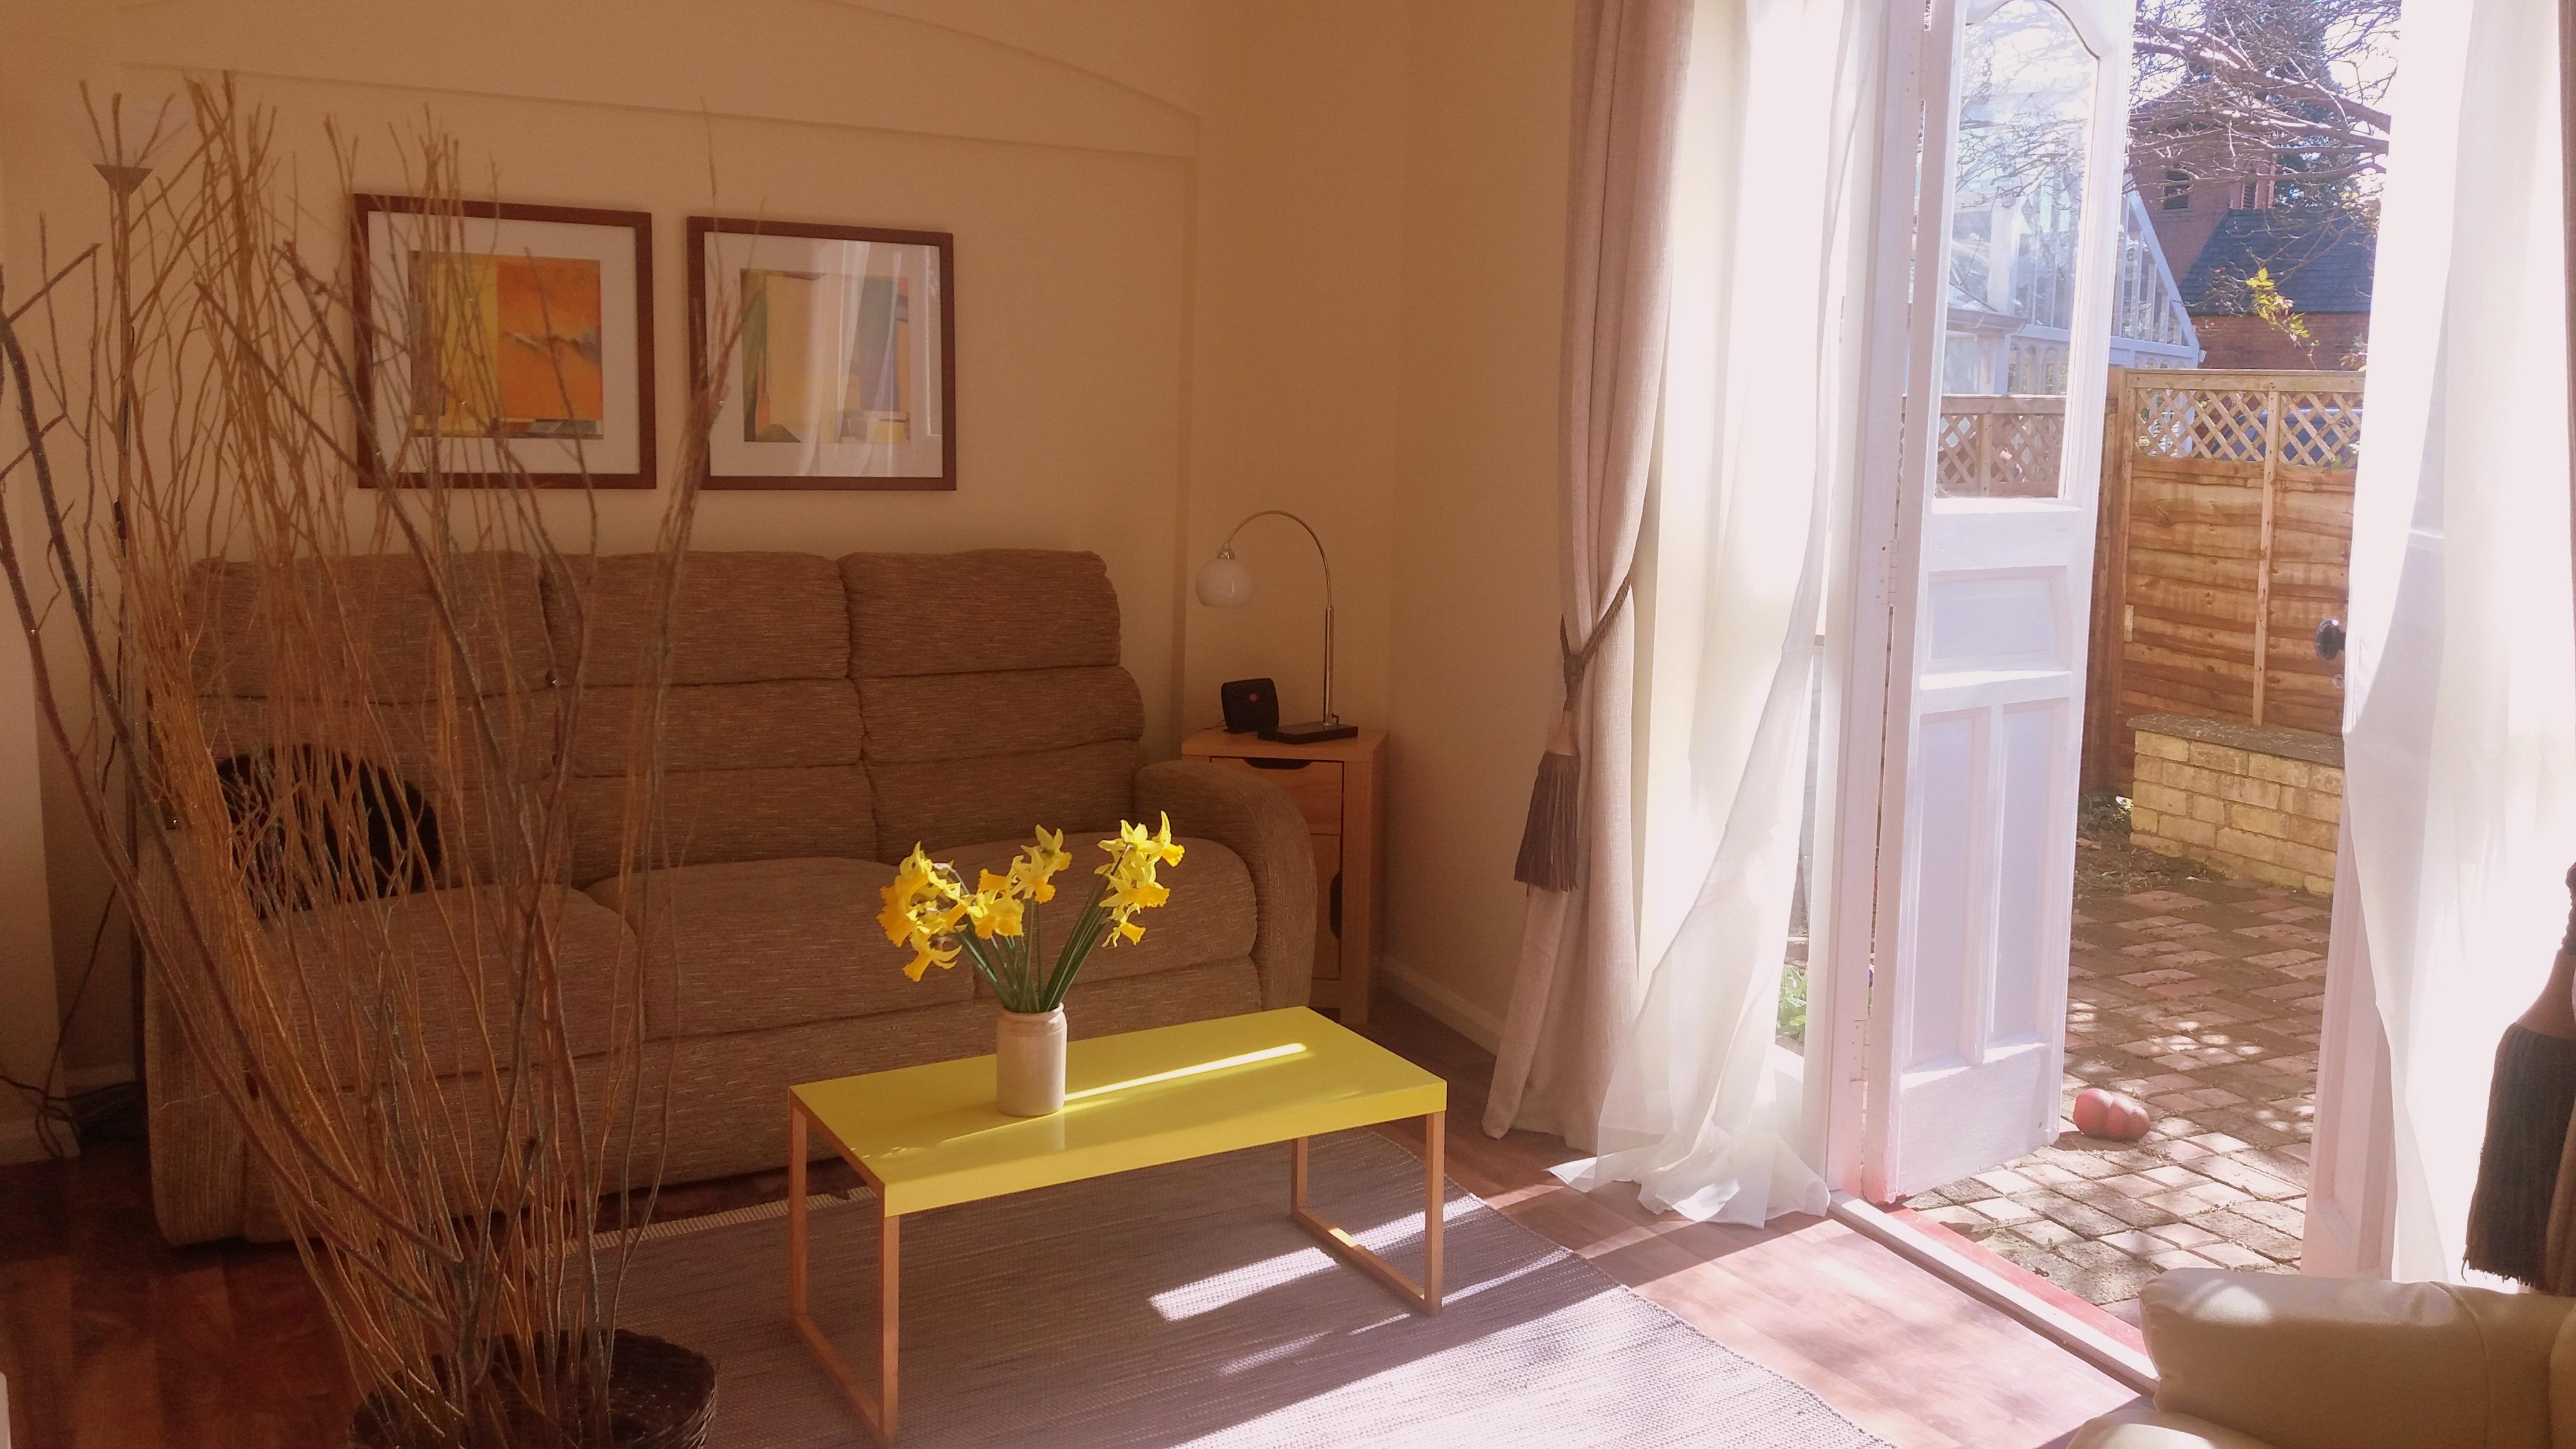 frontroom (2)